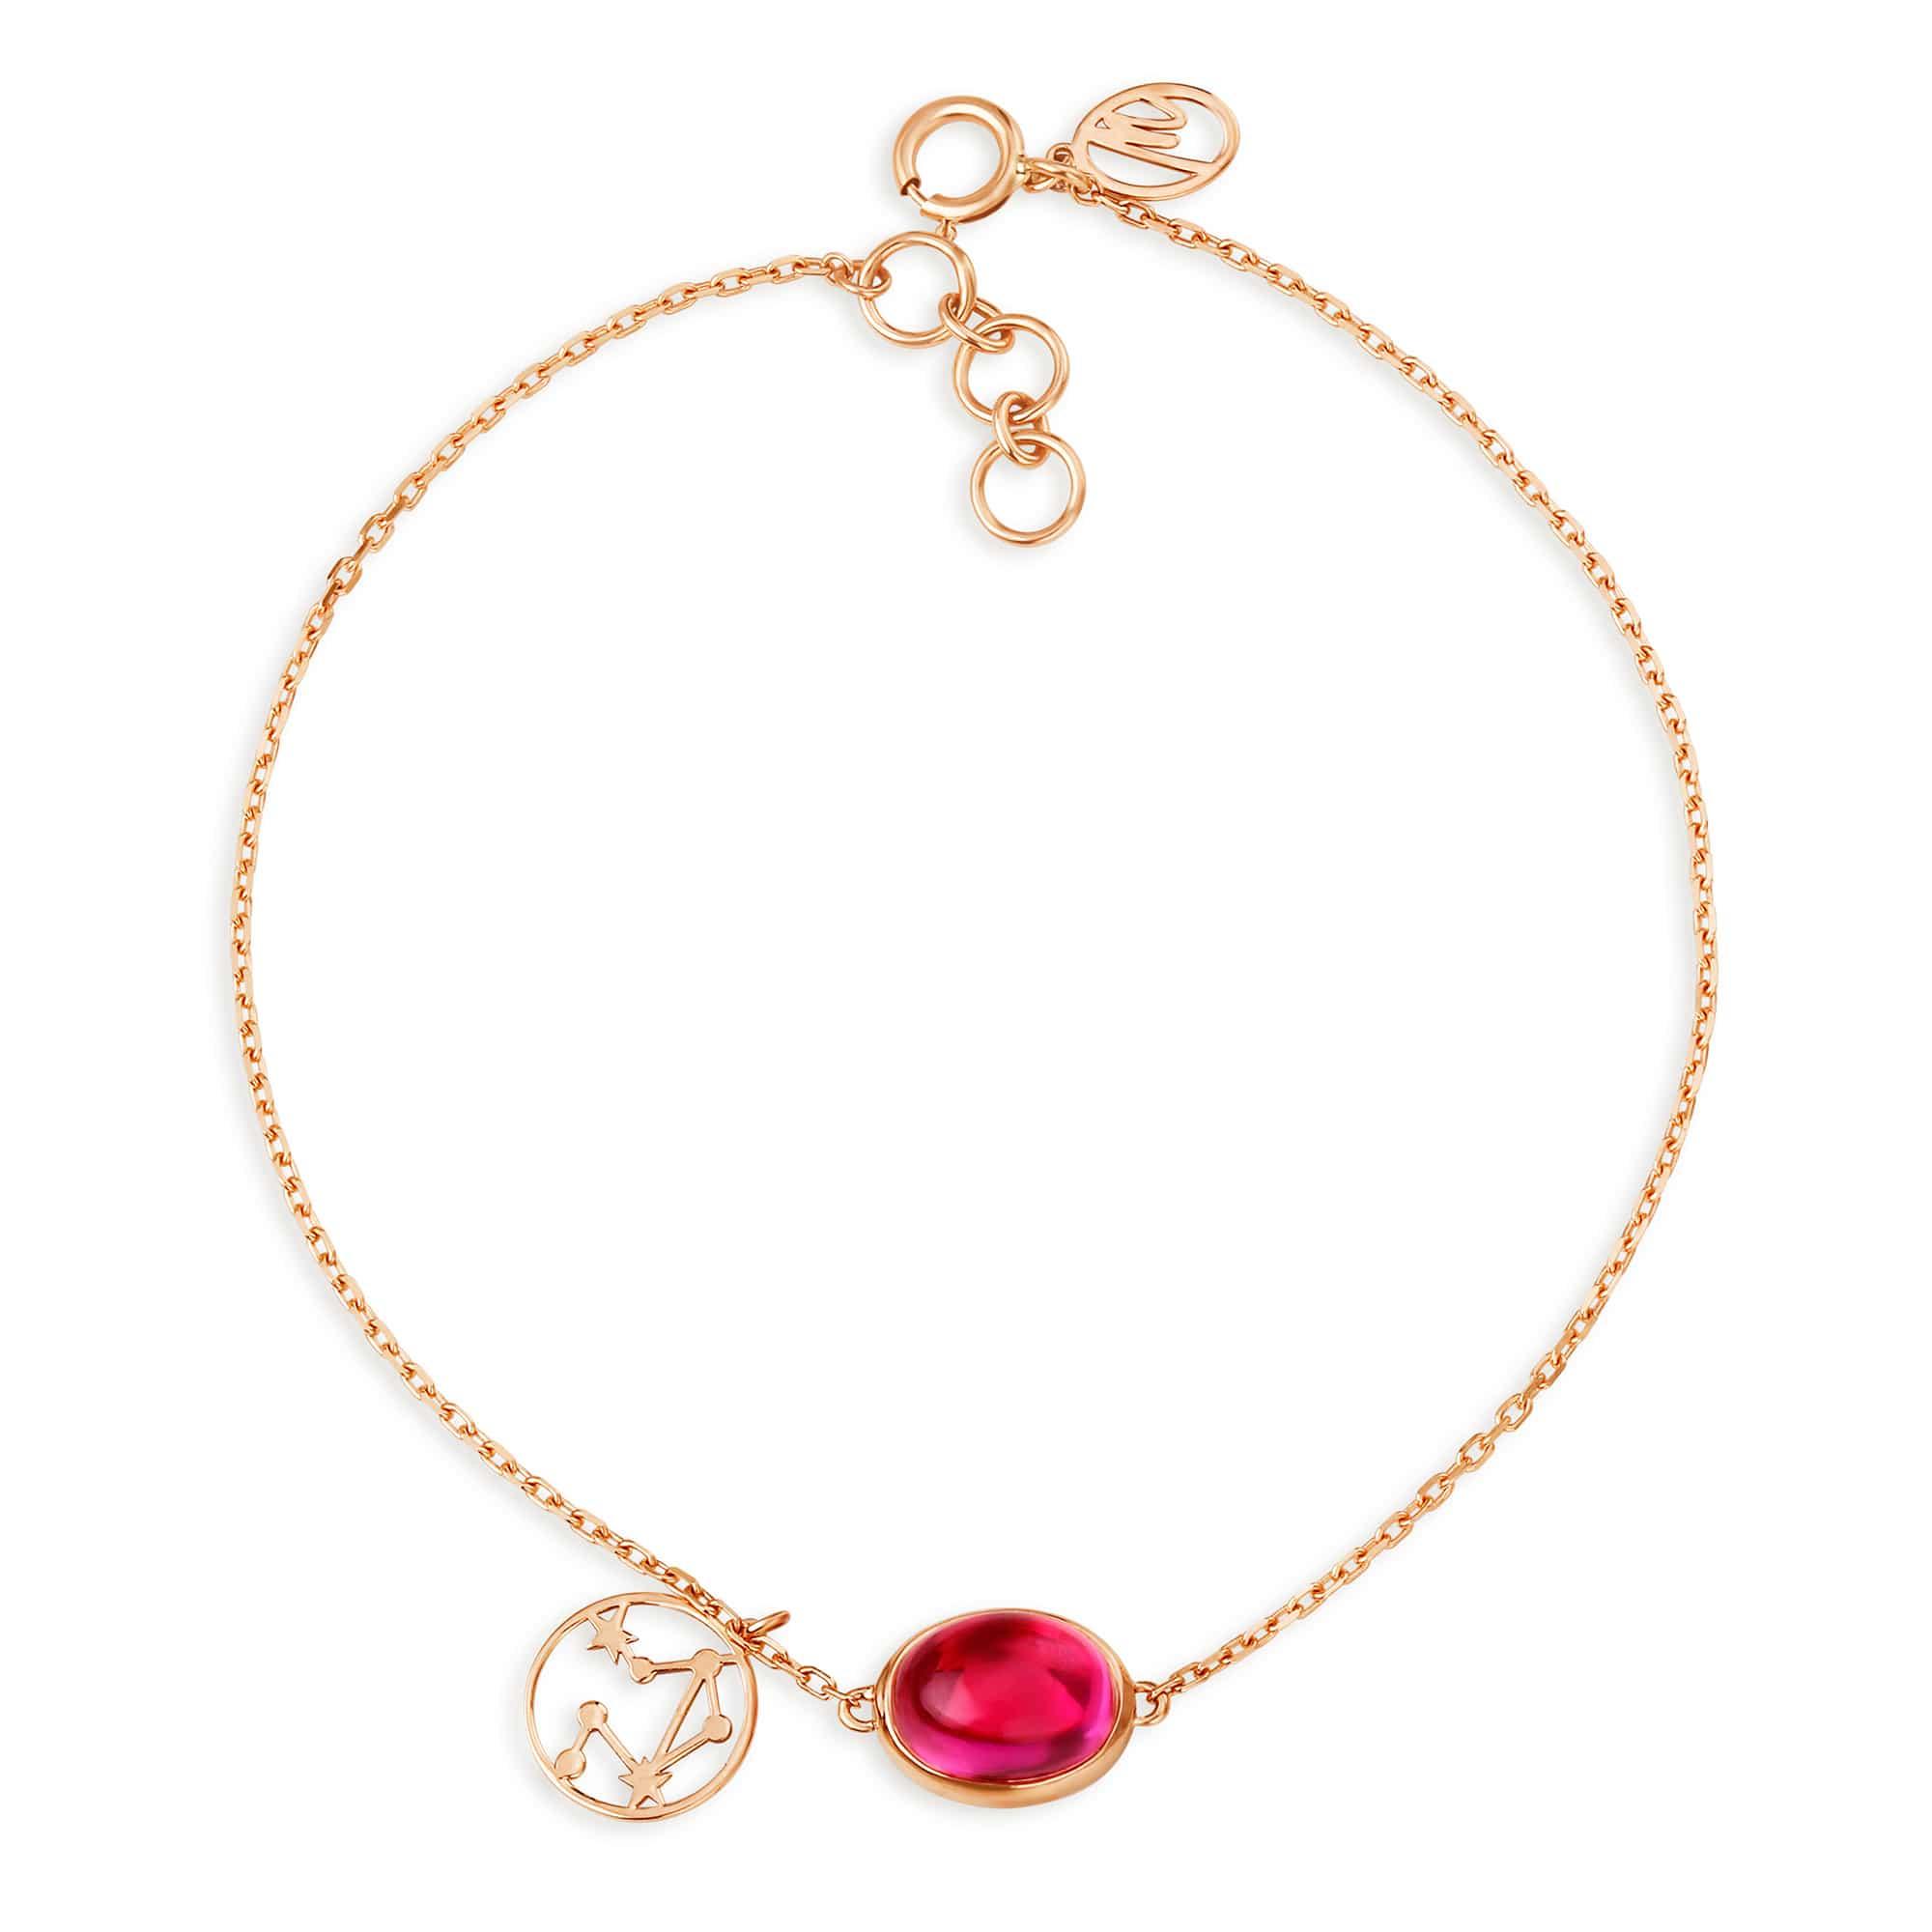 30cbed5e88a71 Mia by Tanishq 14KT Aquarius Birthstone Rose Gold Bracelet   Tanishq